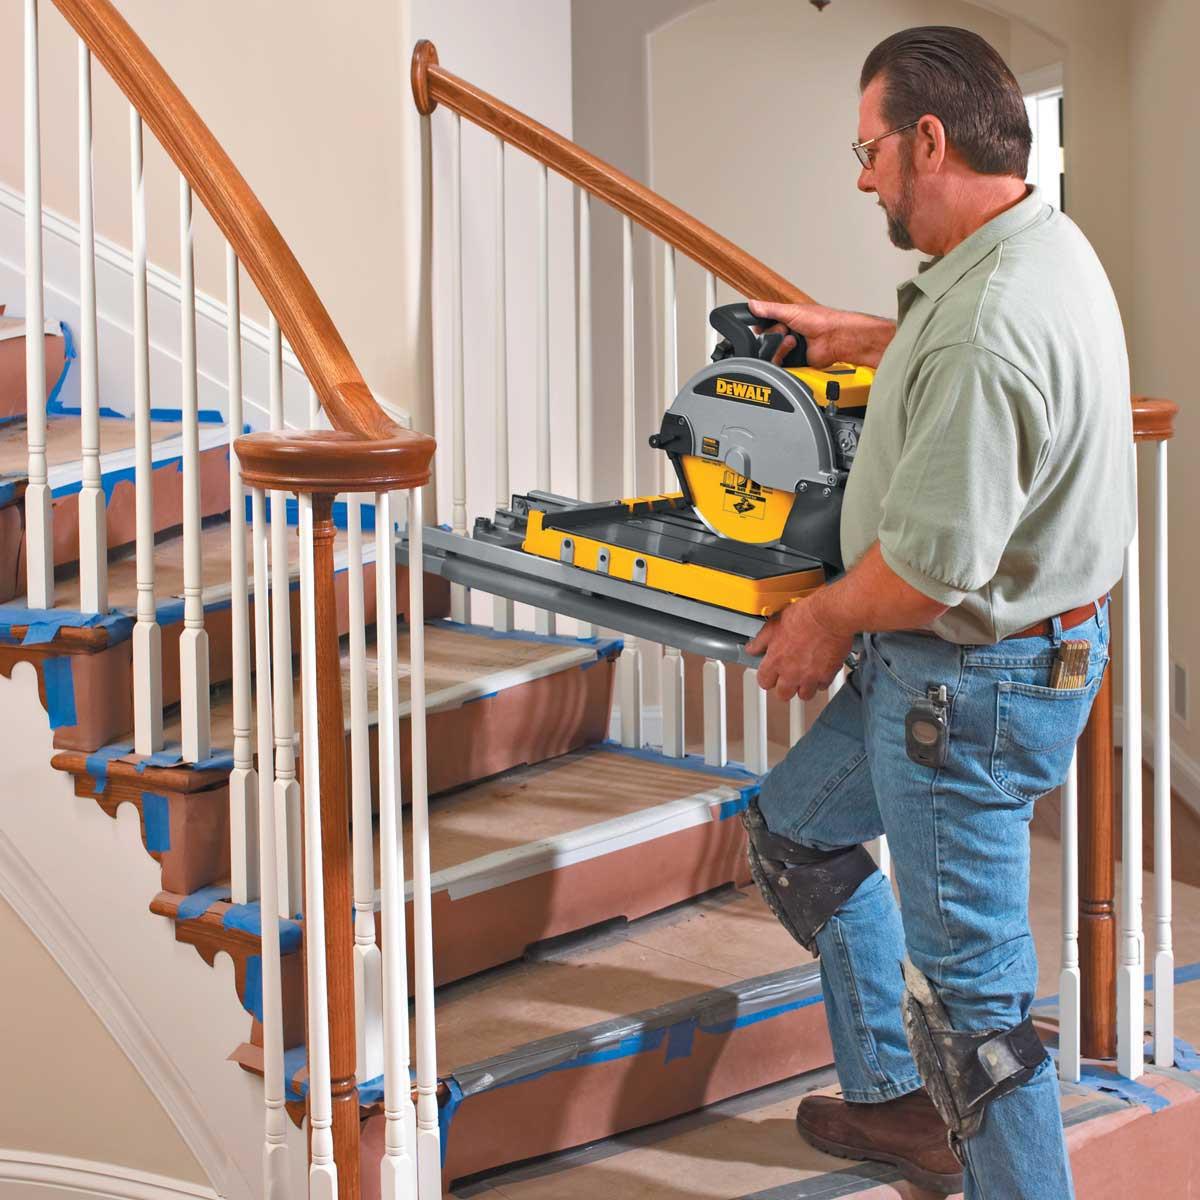 lightweight tile saw